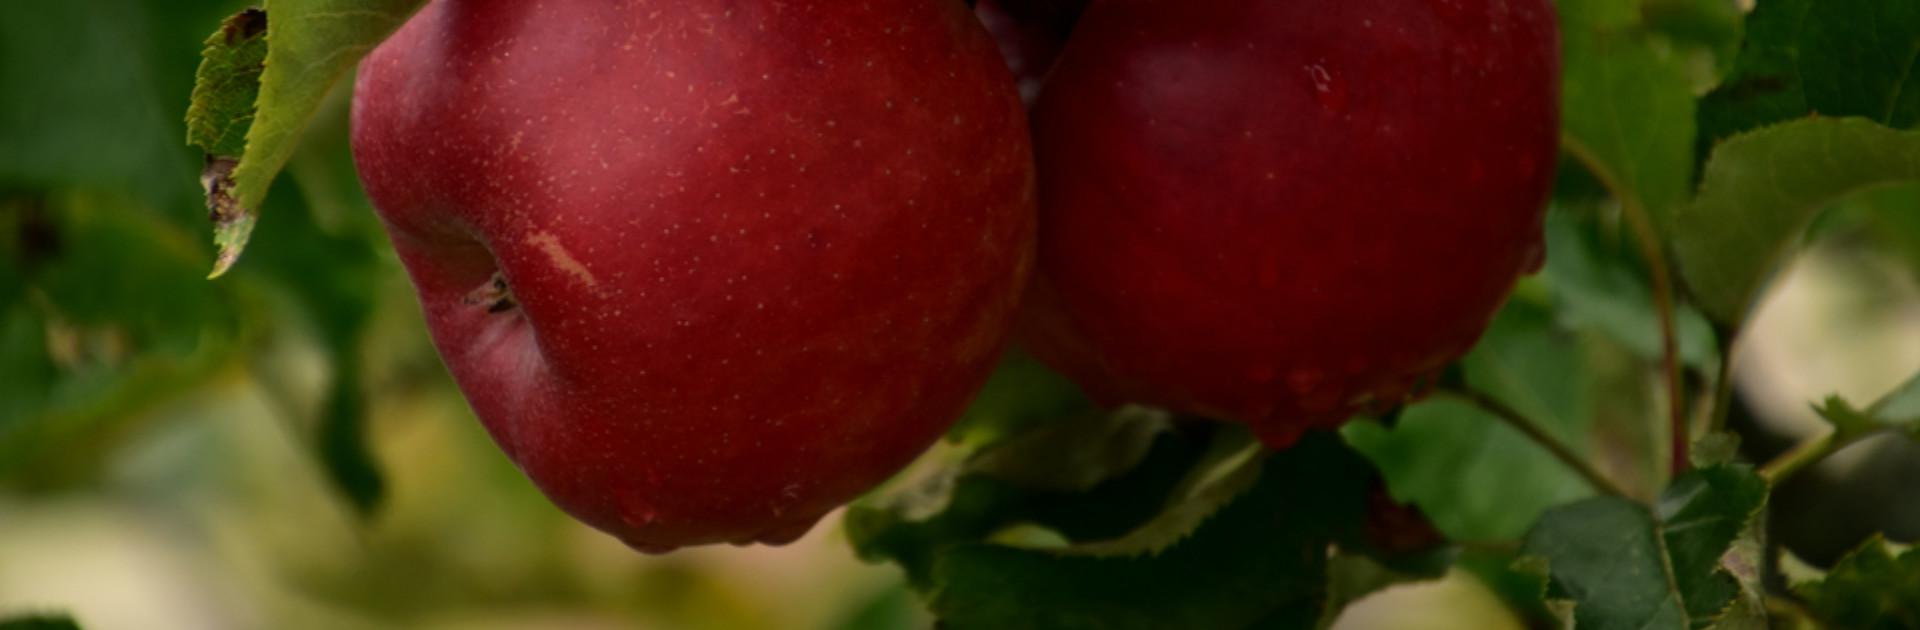 Rote Äpfel im Herbst in Miesenbach